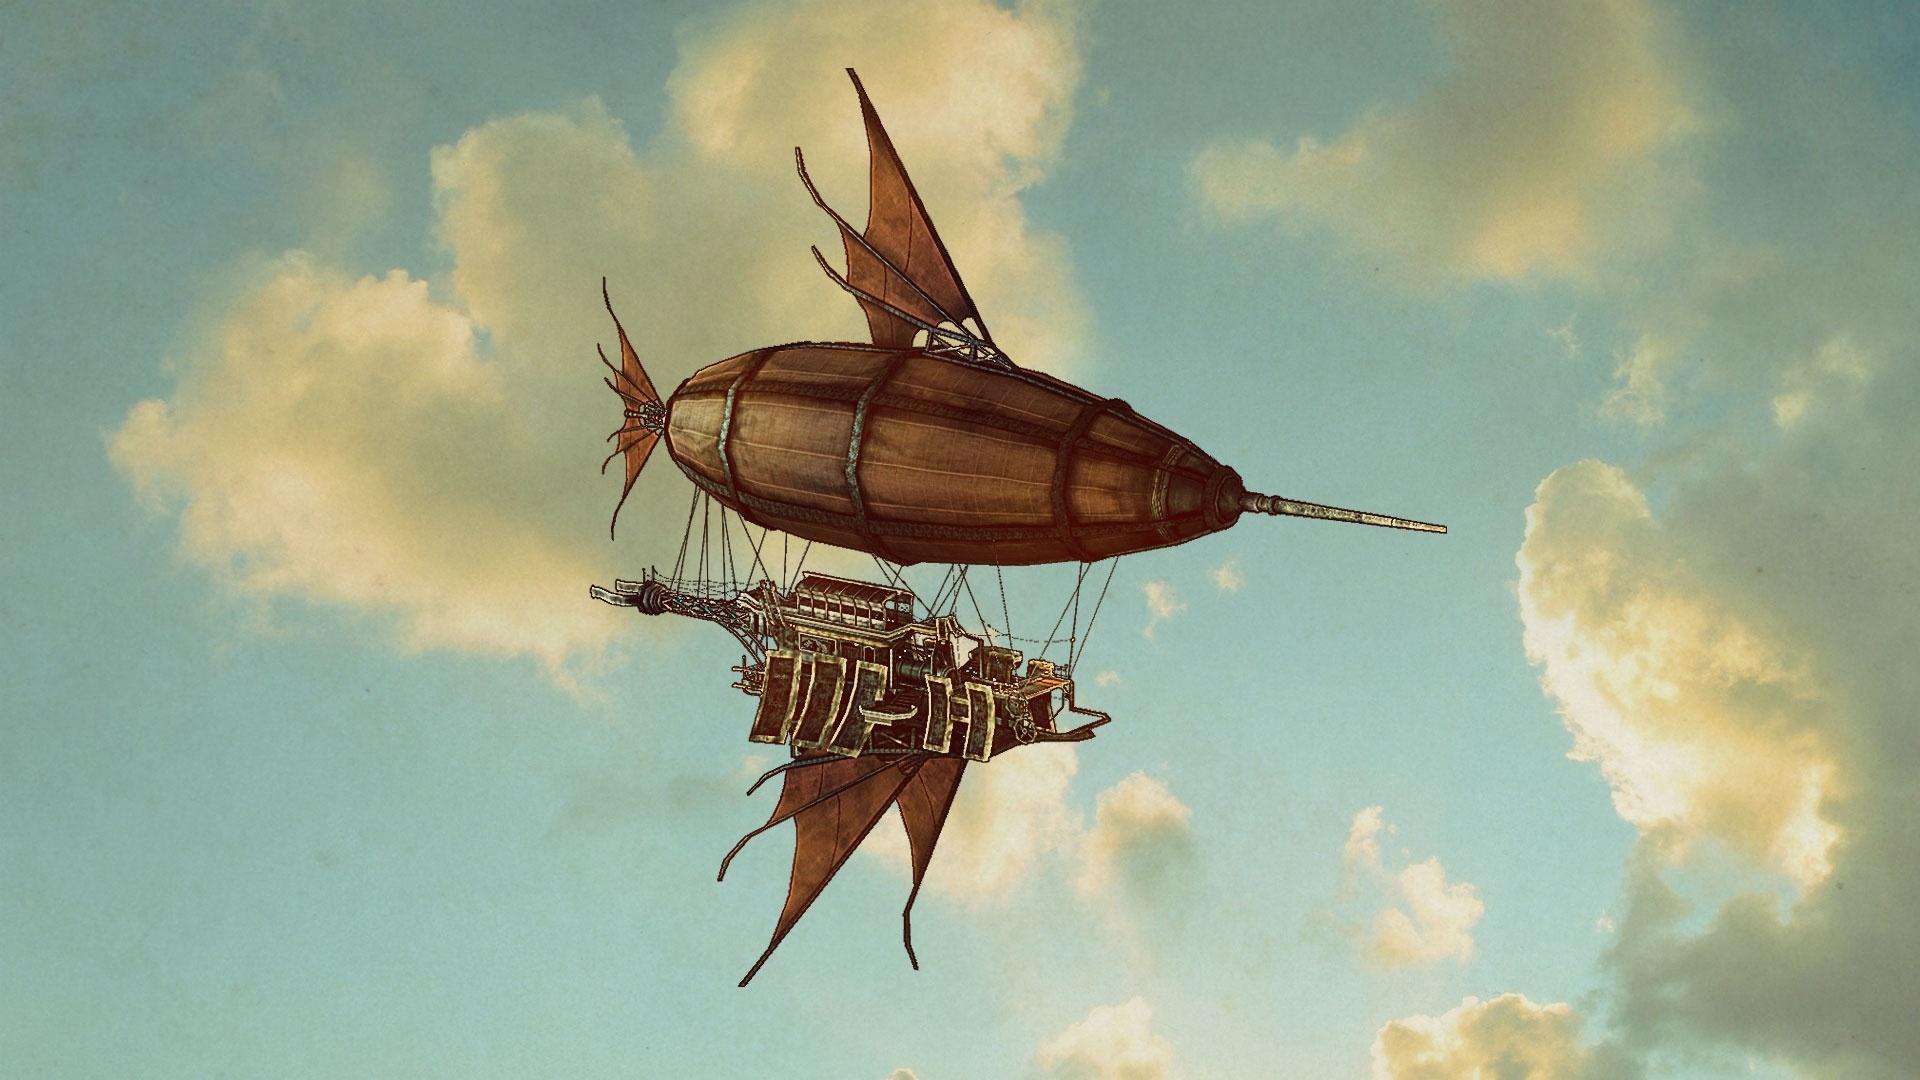 Airship Art wallpaper photo hd